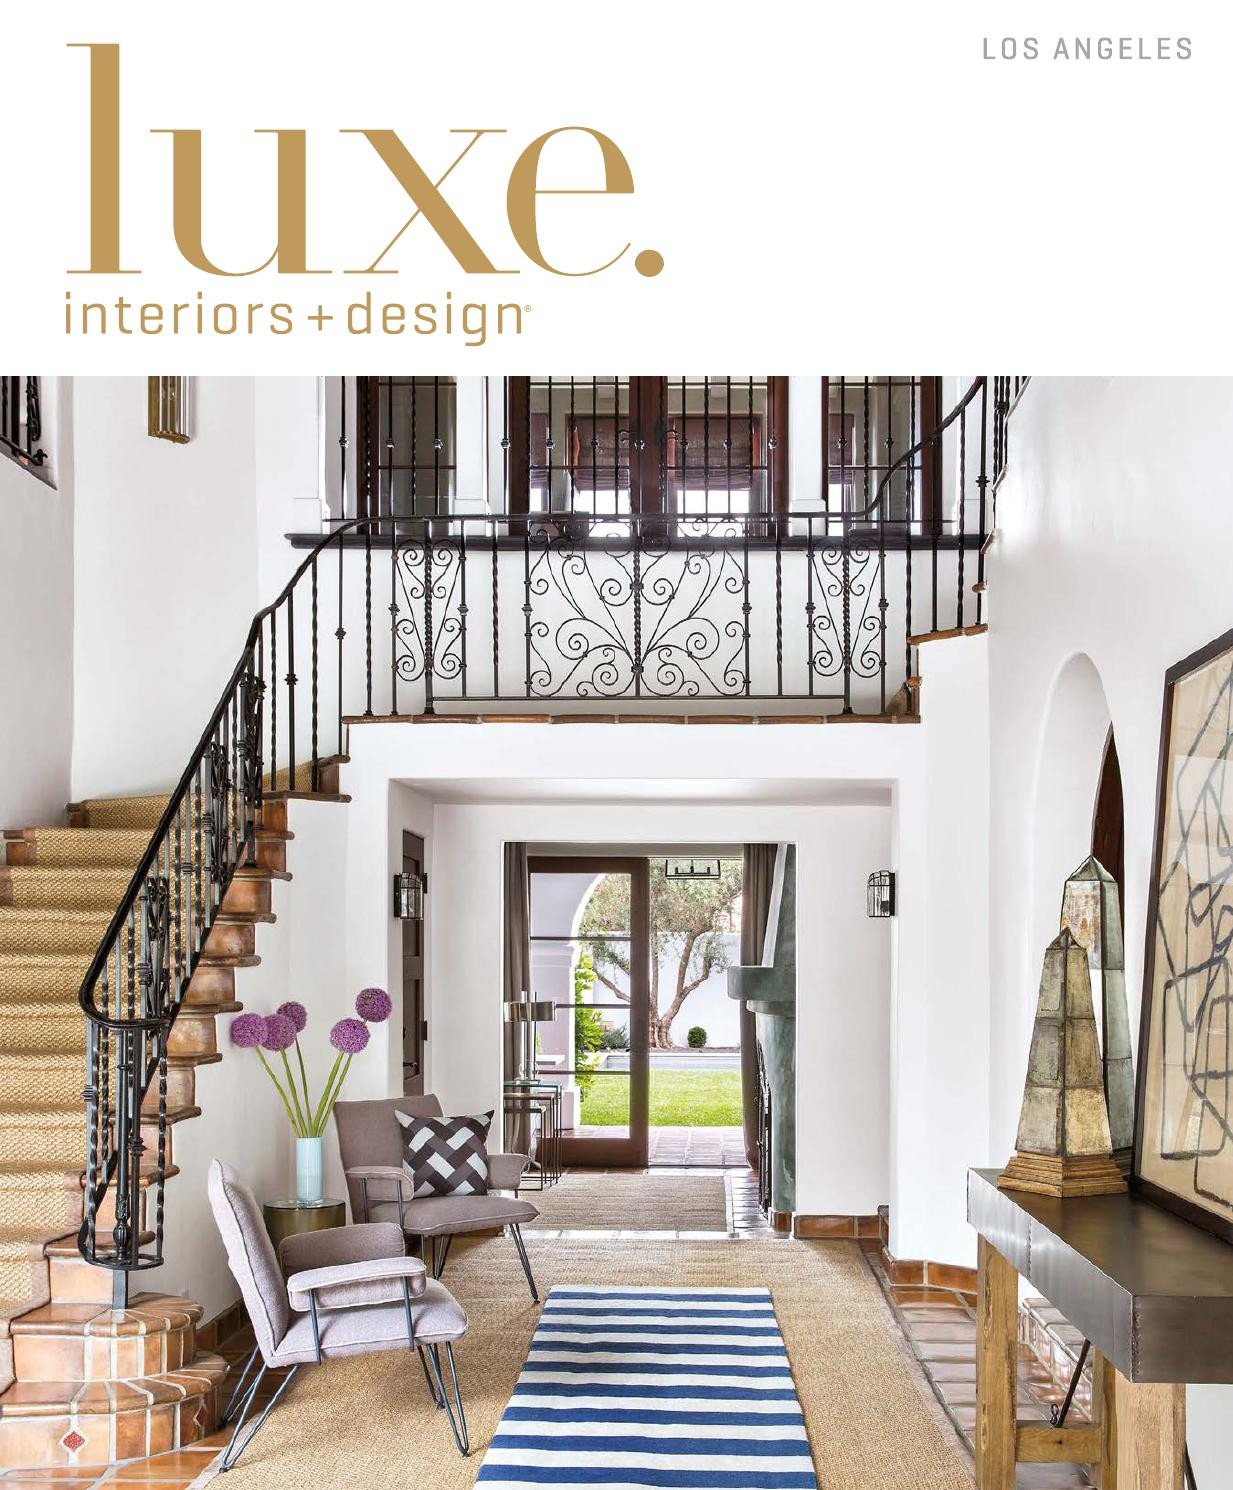 dansk acacia hardwood flooring of luxe magazine september 2015 los angeles by sandowa issuu regarding page 1